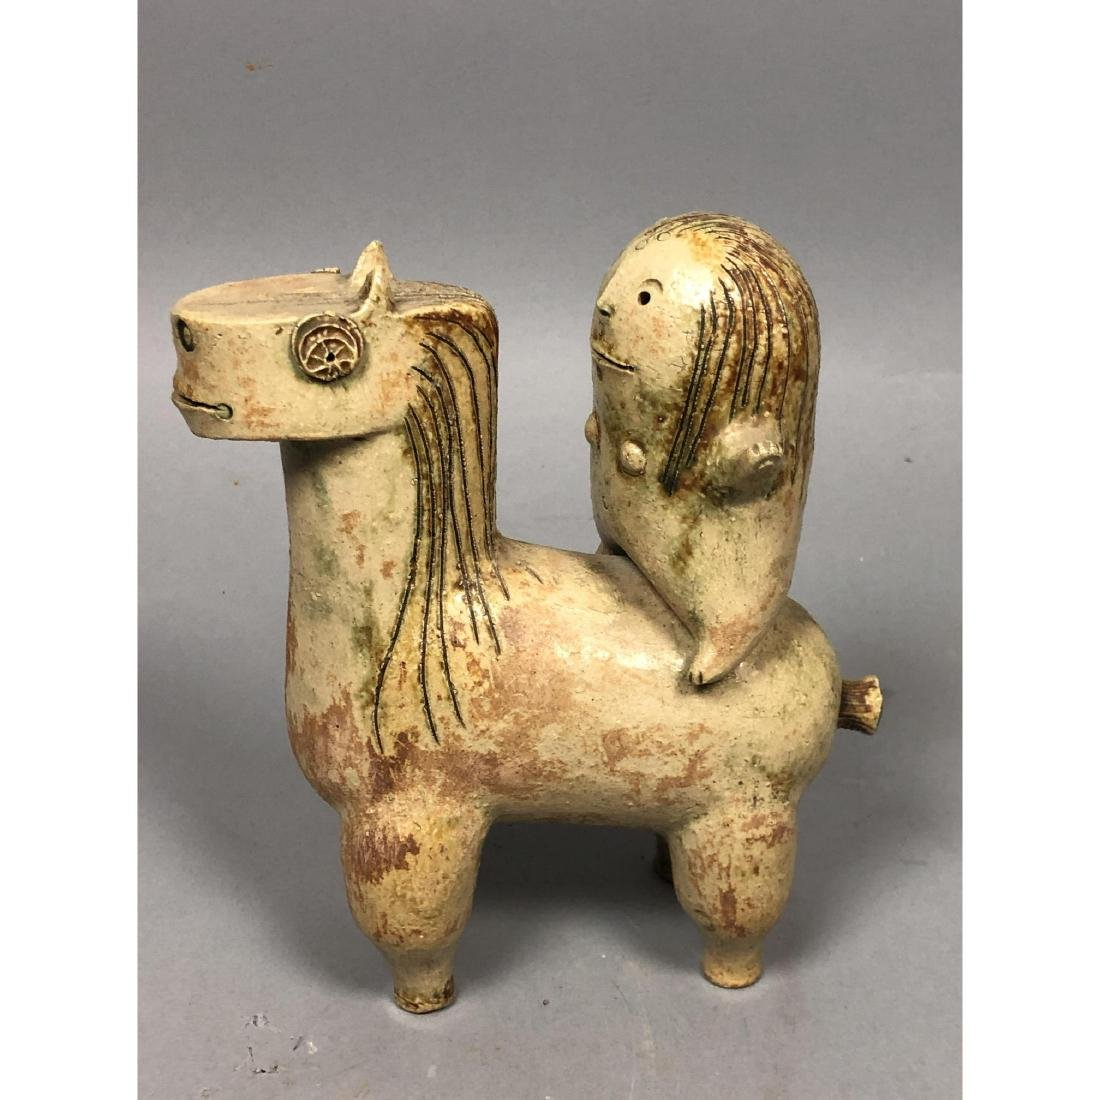 HANS DE JONG Pottery Sculpture. Pottery Horse & R - 6